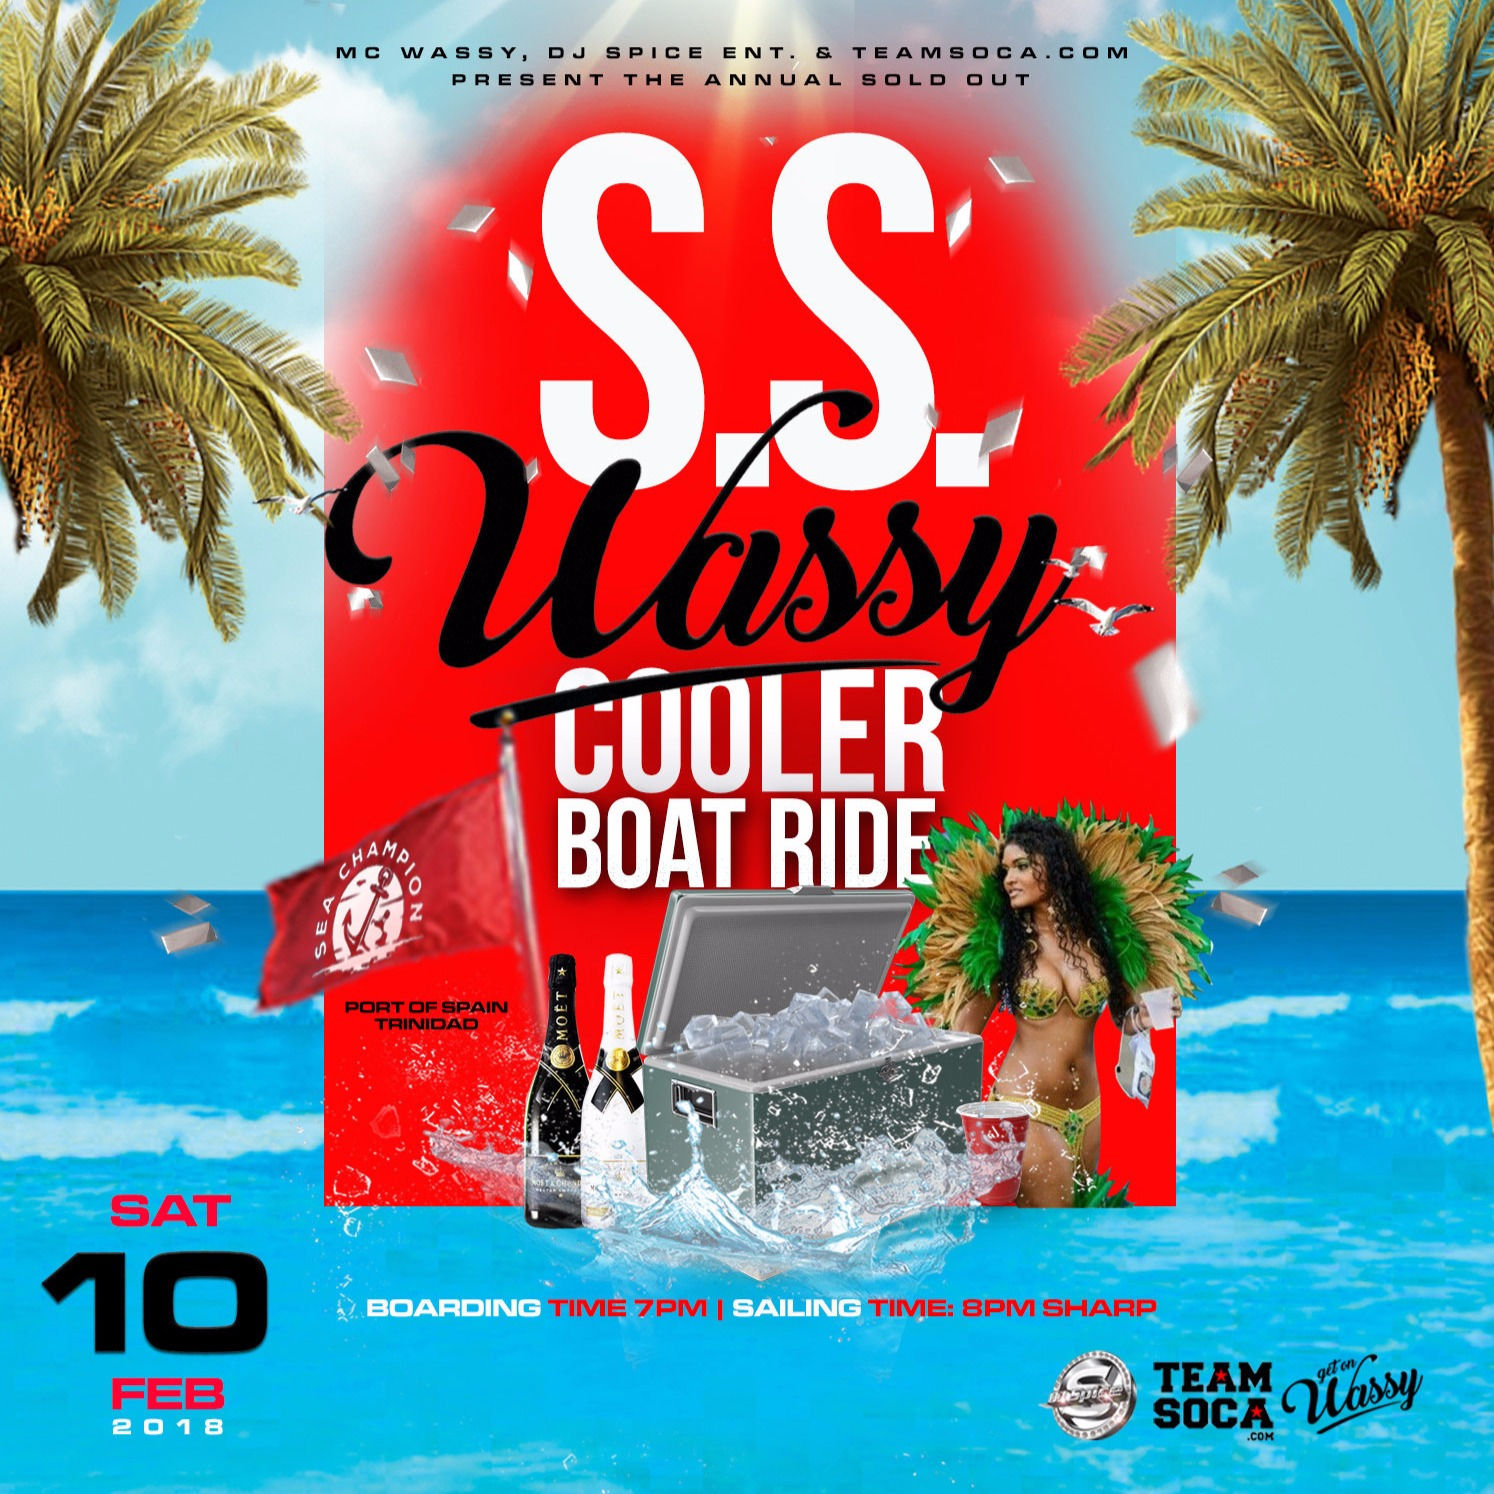 SS Wassy Cooler Boatride 2018